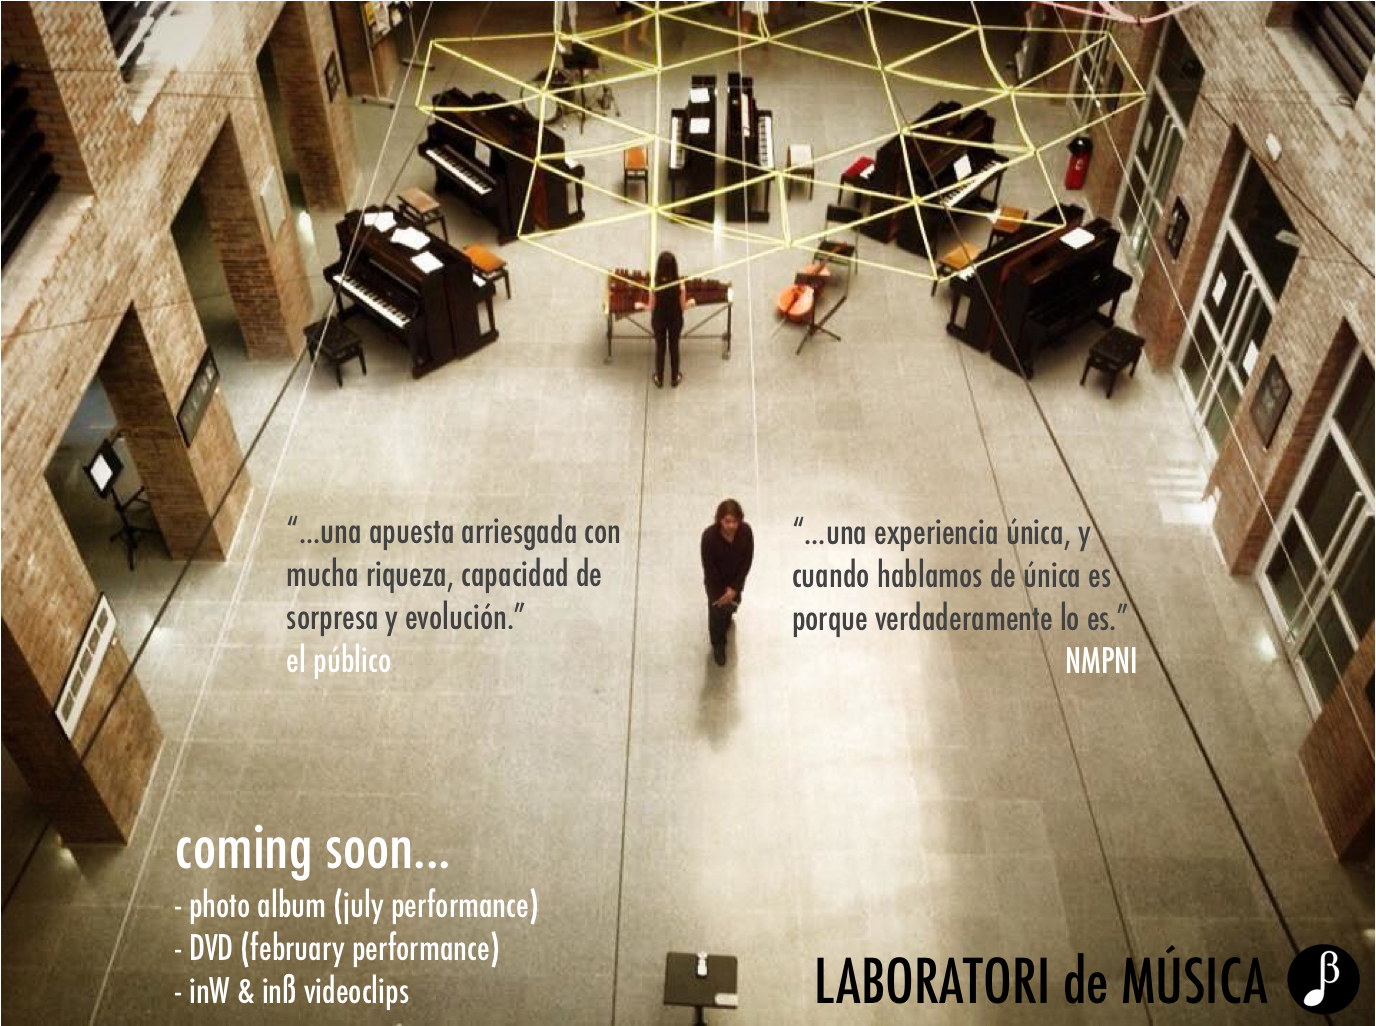 laboratori coming soon